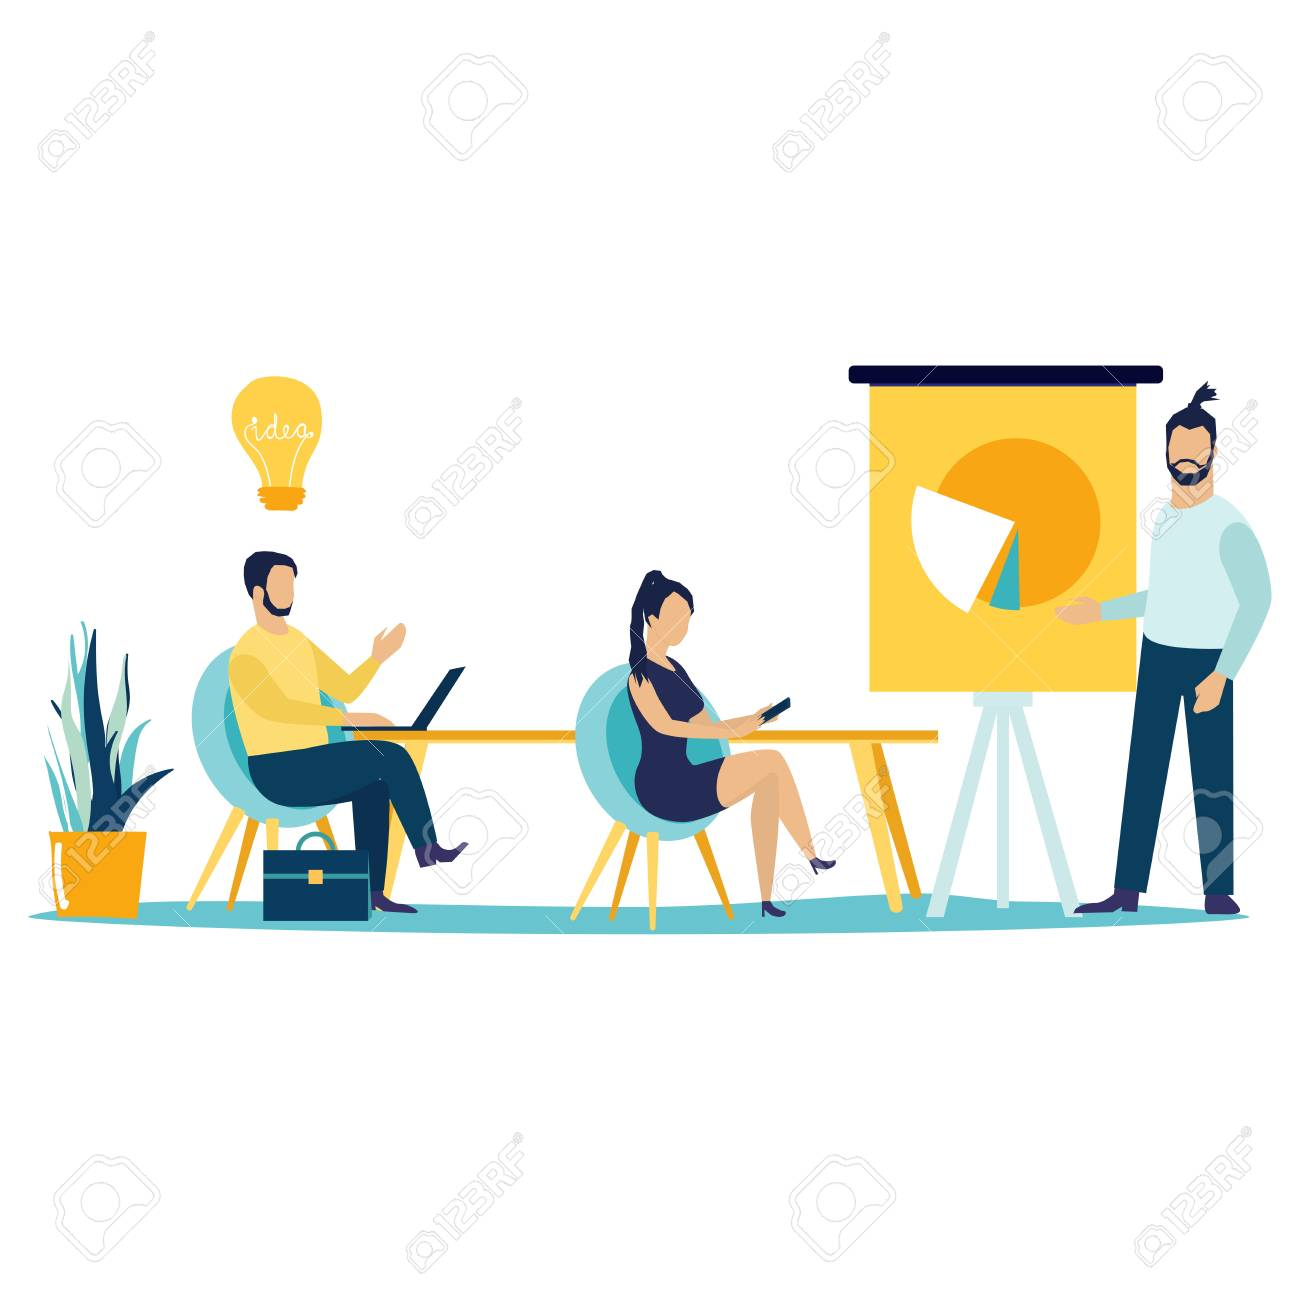 business teamwork concept man making presentation on conference